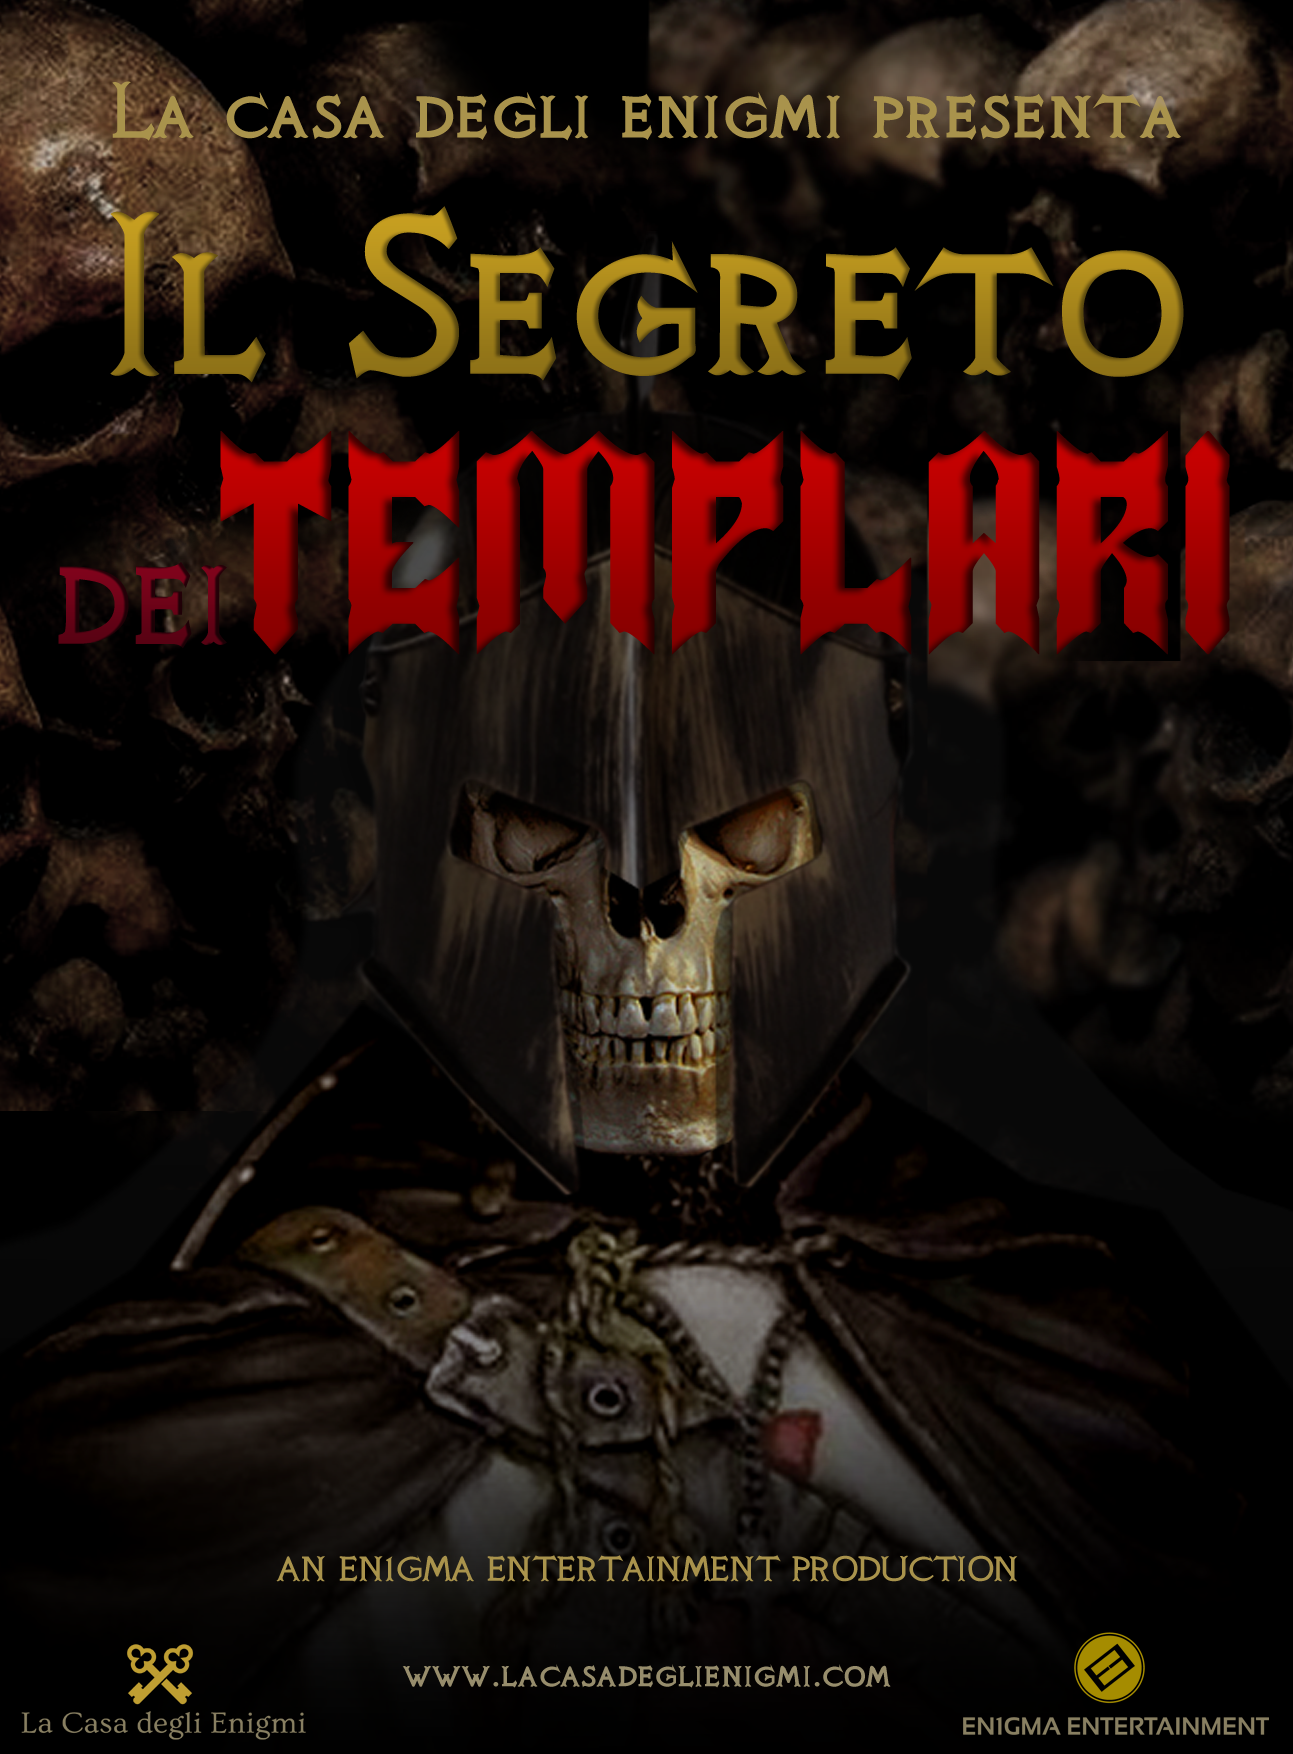 IlSegreto dei Templari